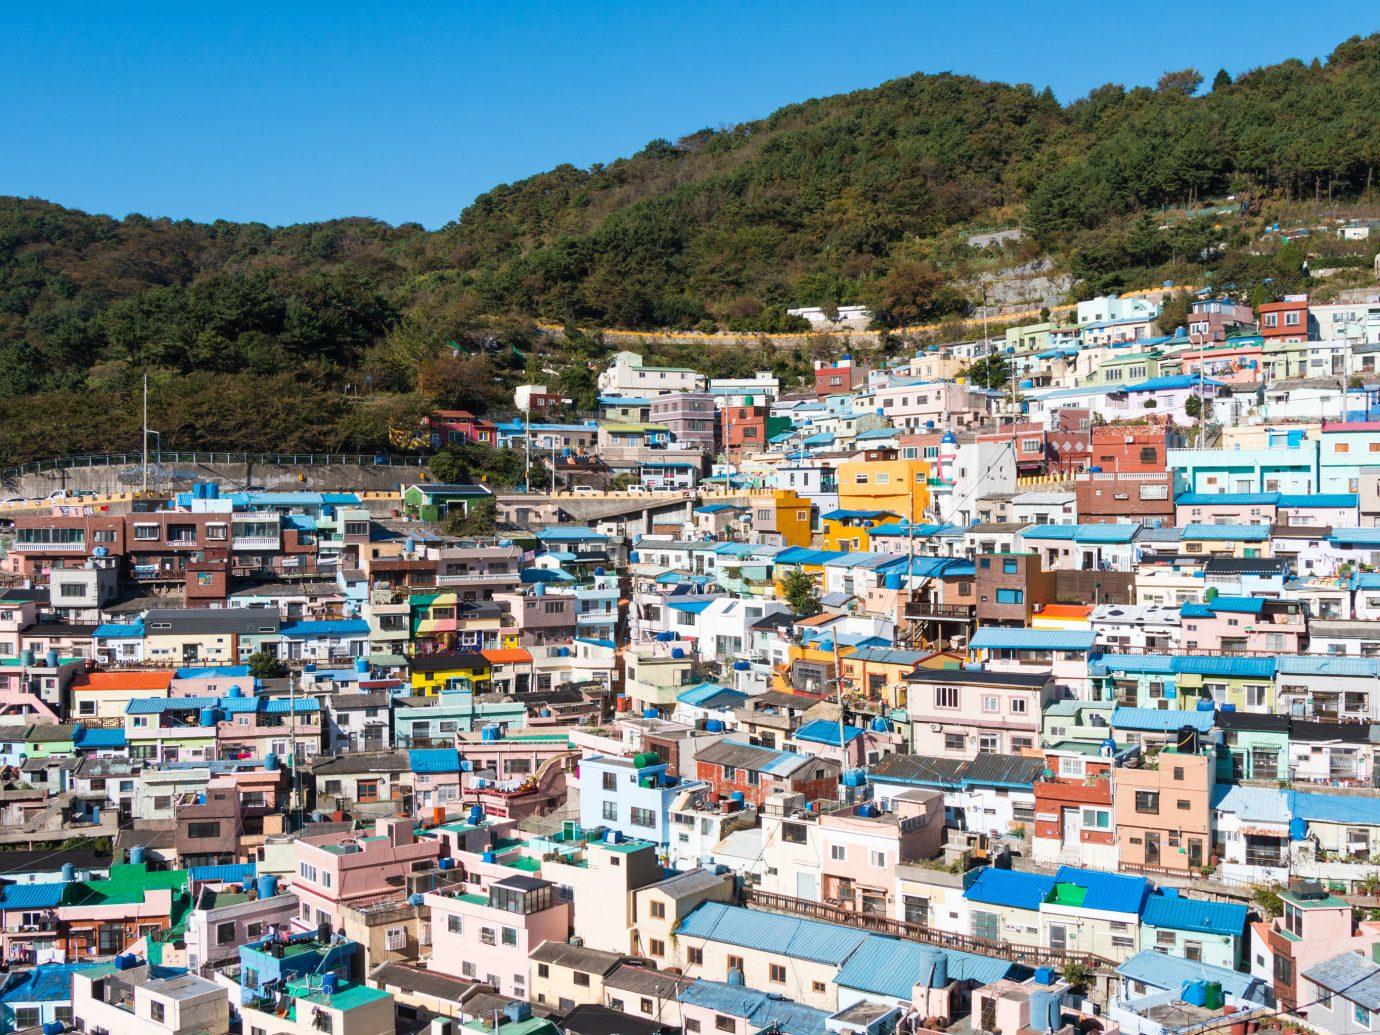 Trip Ideas urban area City Town sky neighbourhood Village mountain tourism suburb slum